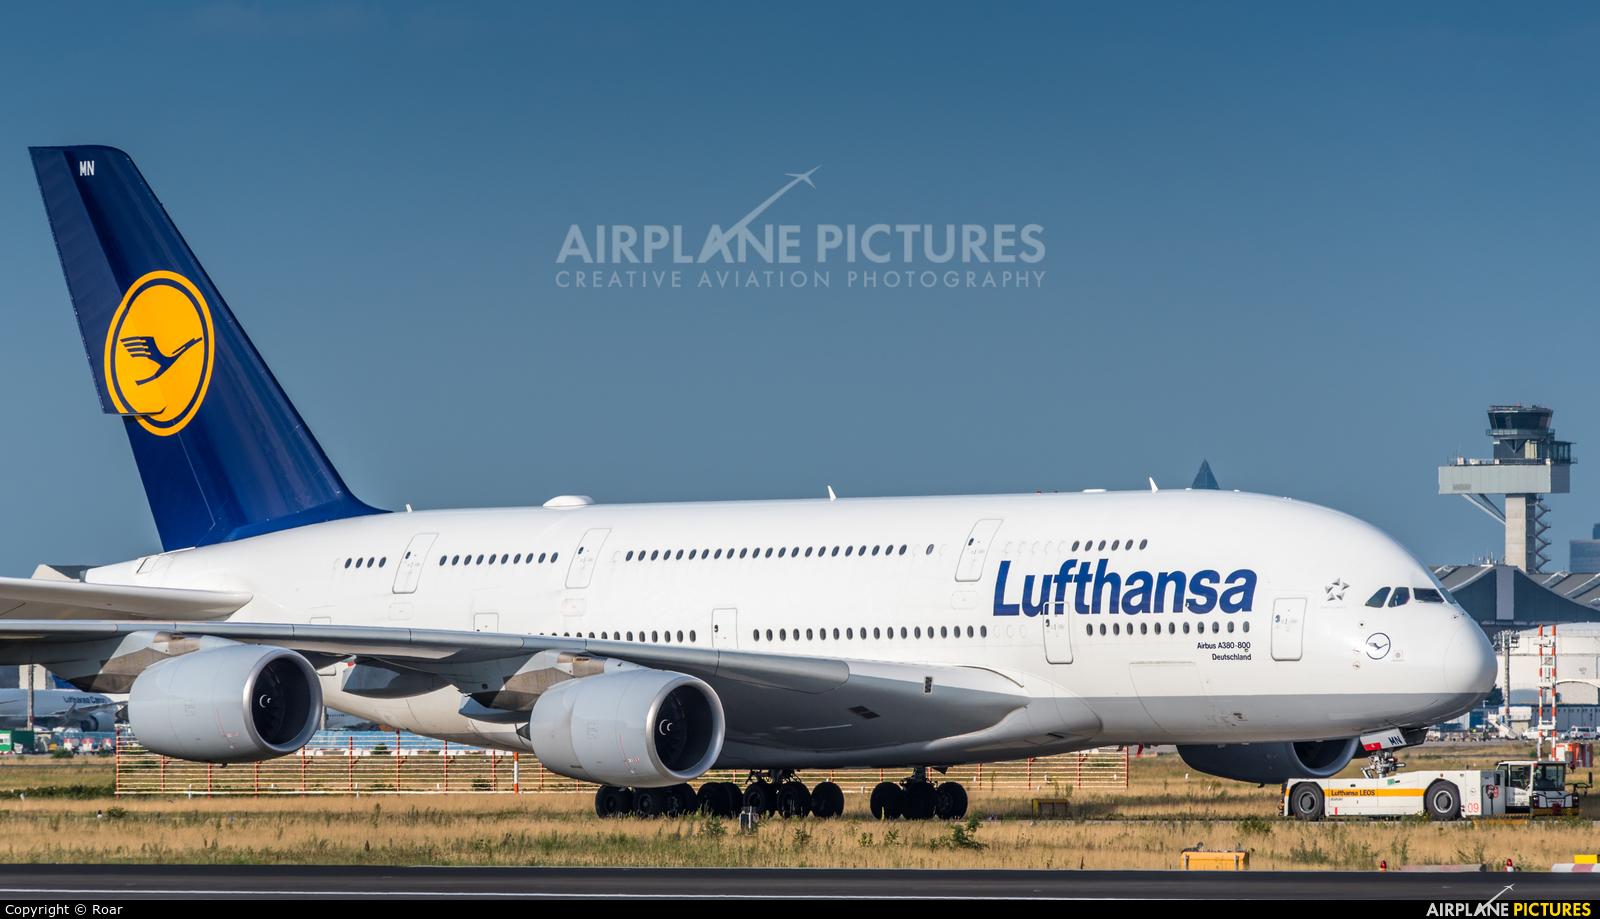 Lufthansa D-AIMN aircraft at Frankfurt